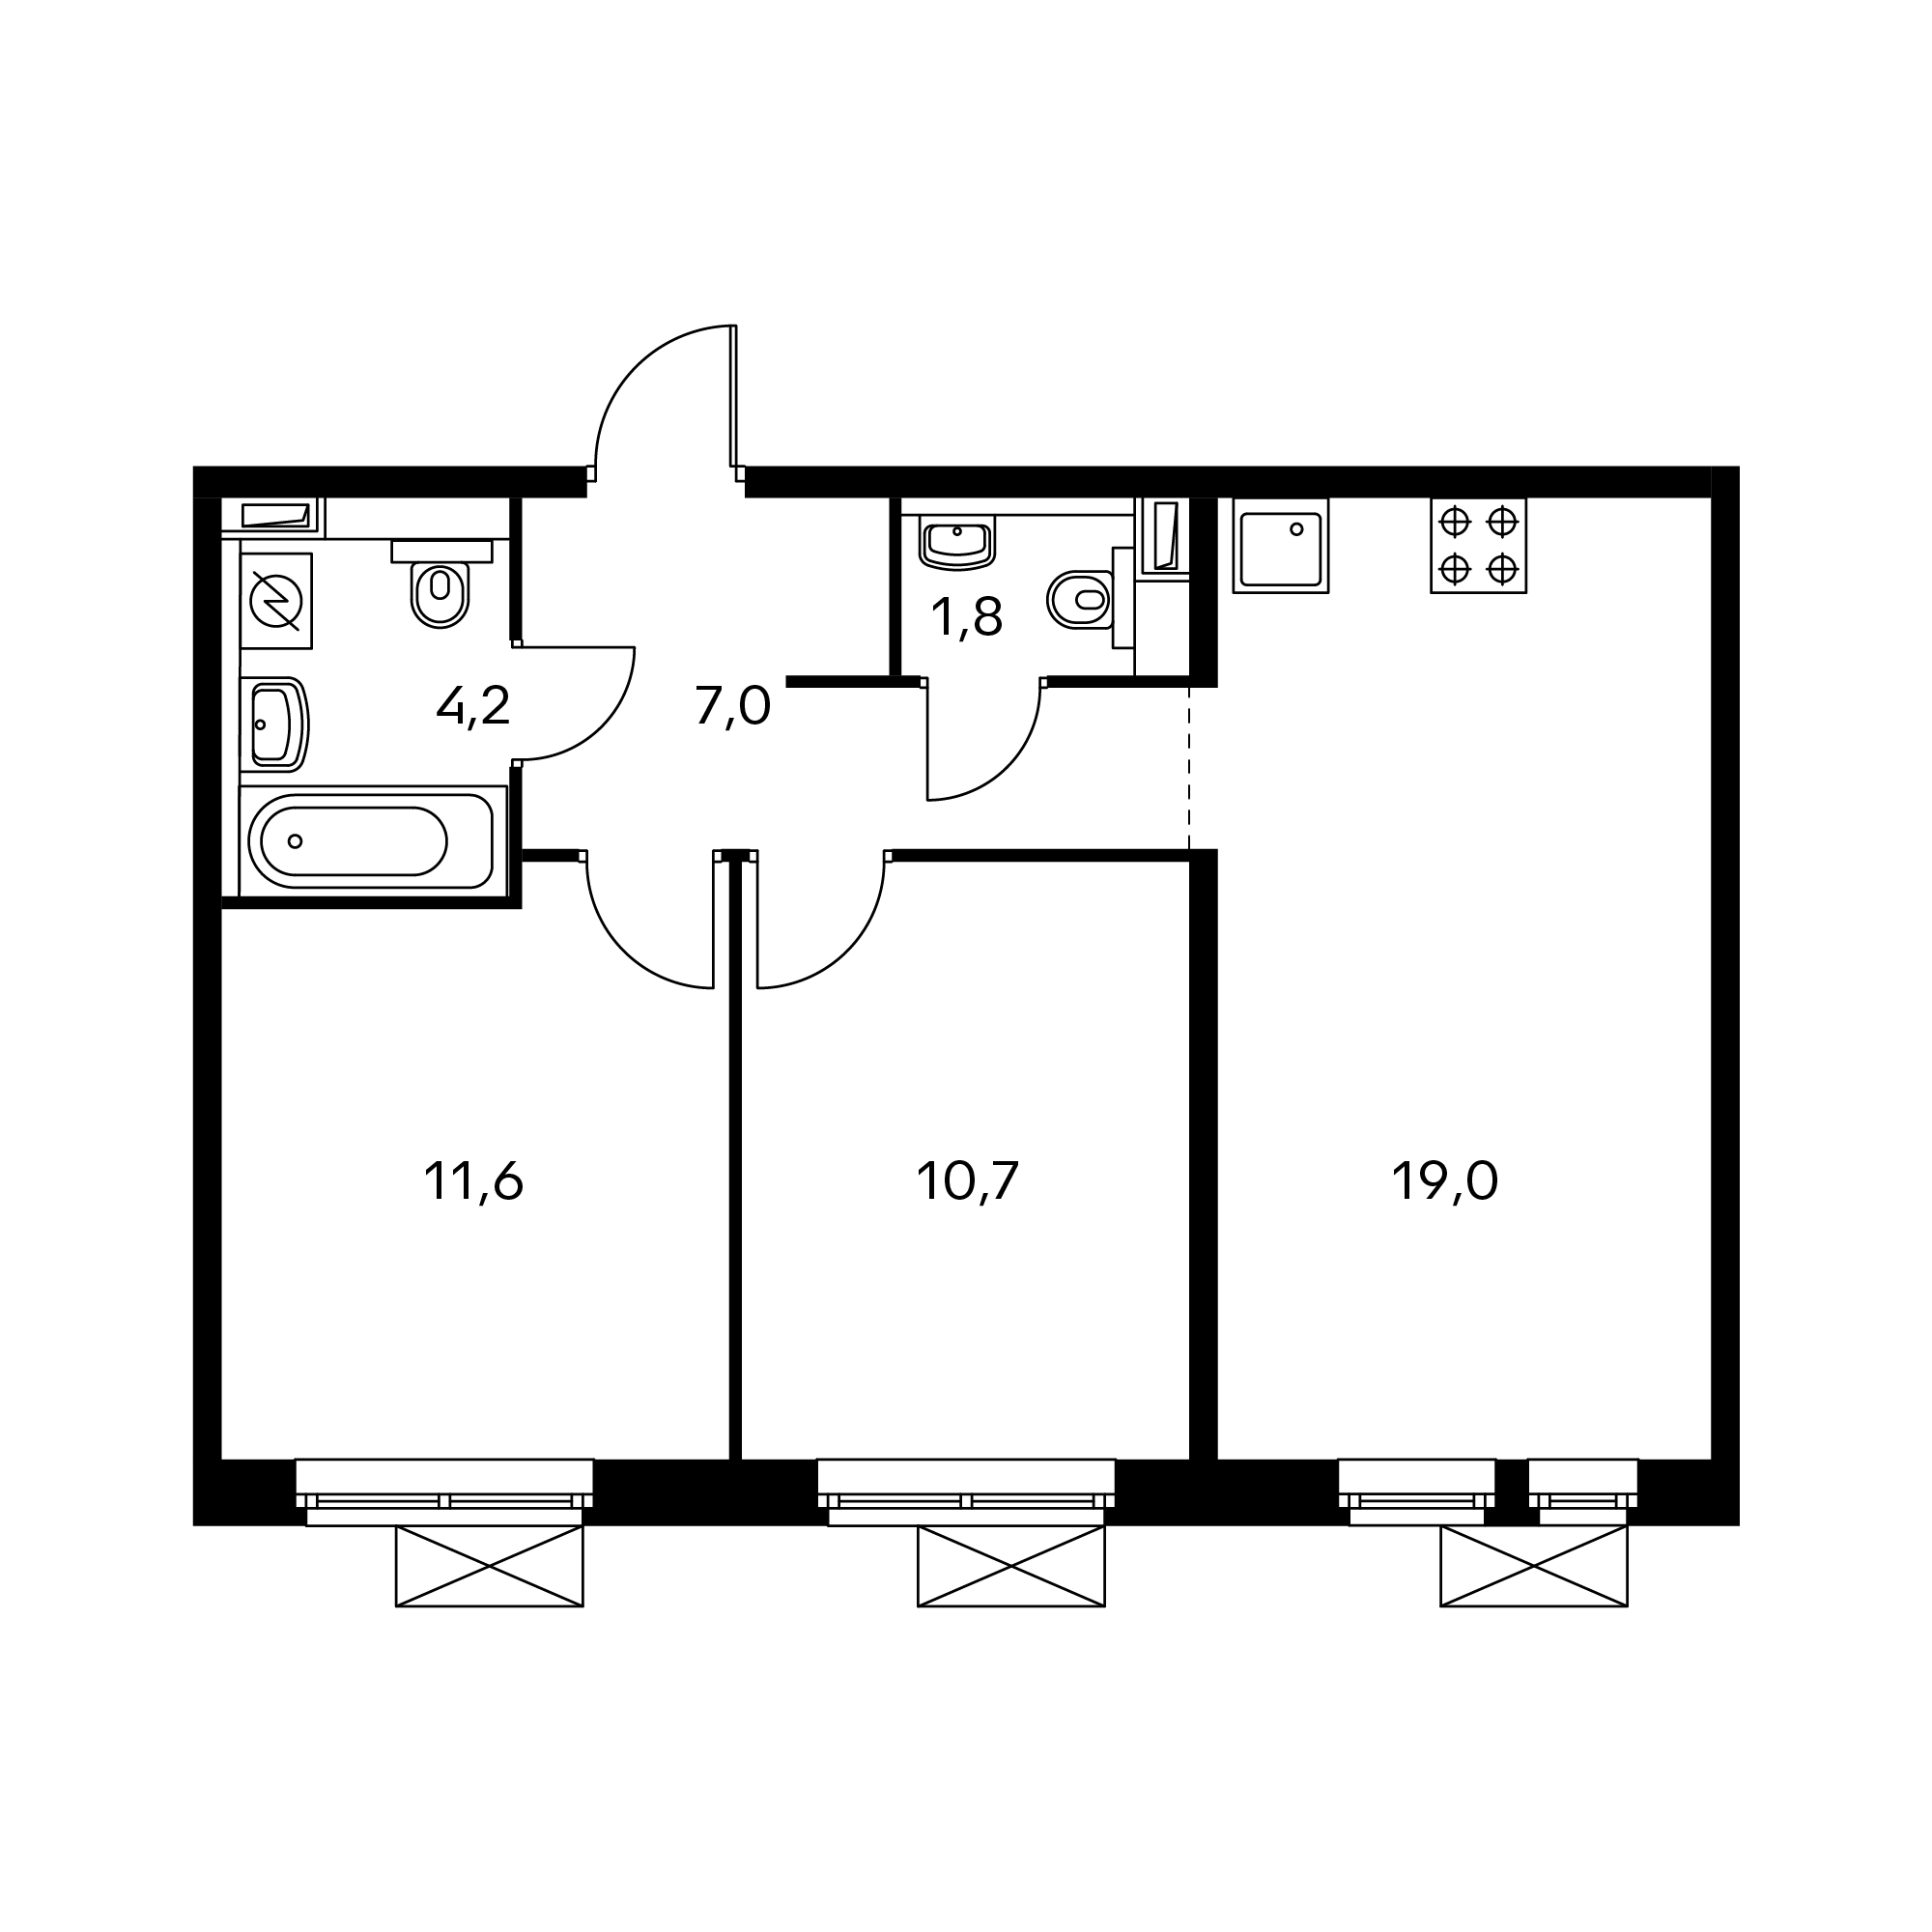 2ES8_9.6-1